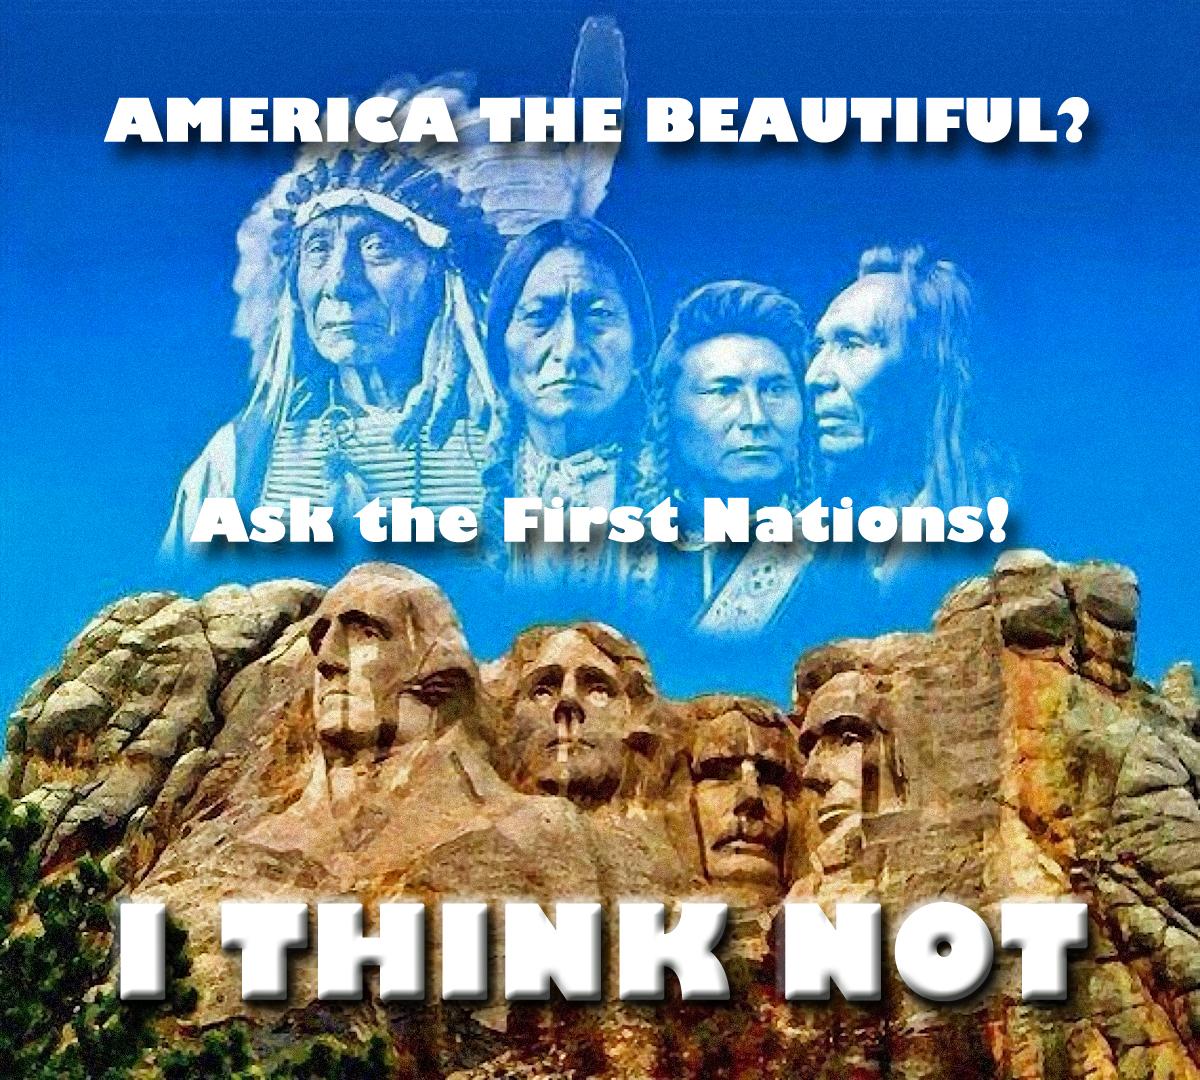 00 REAL Mount Rushmore. 06.05.15